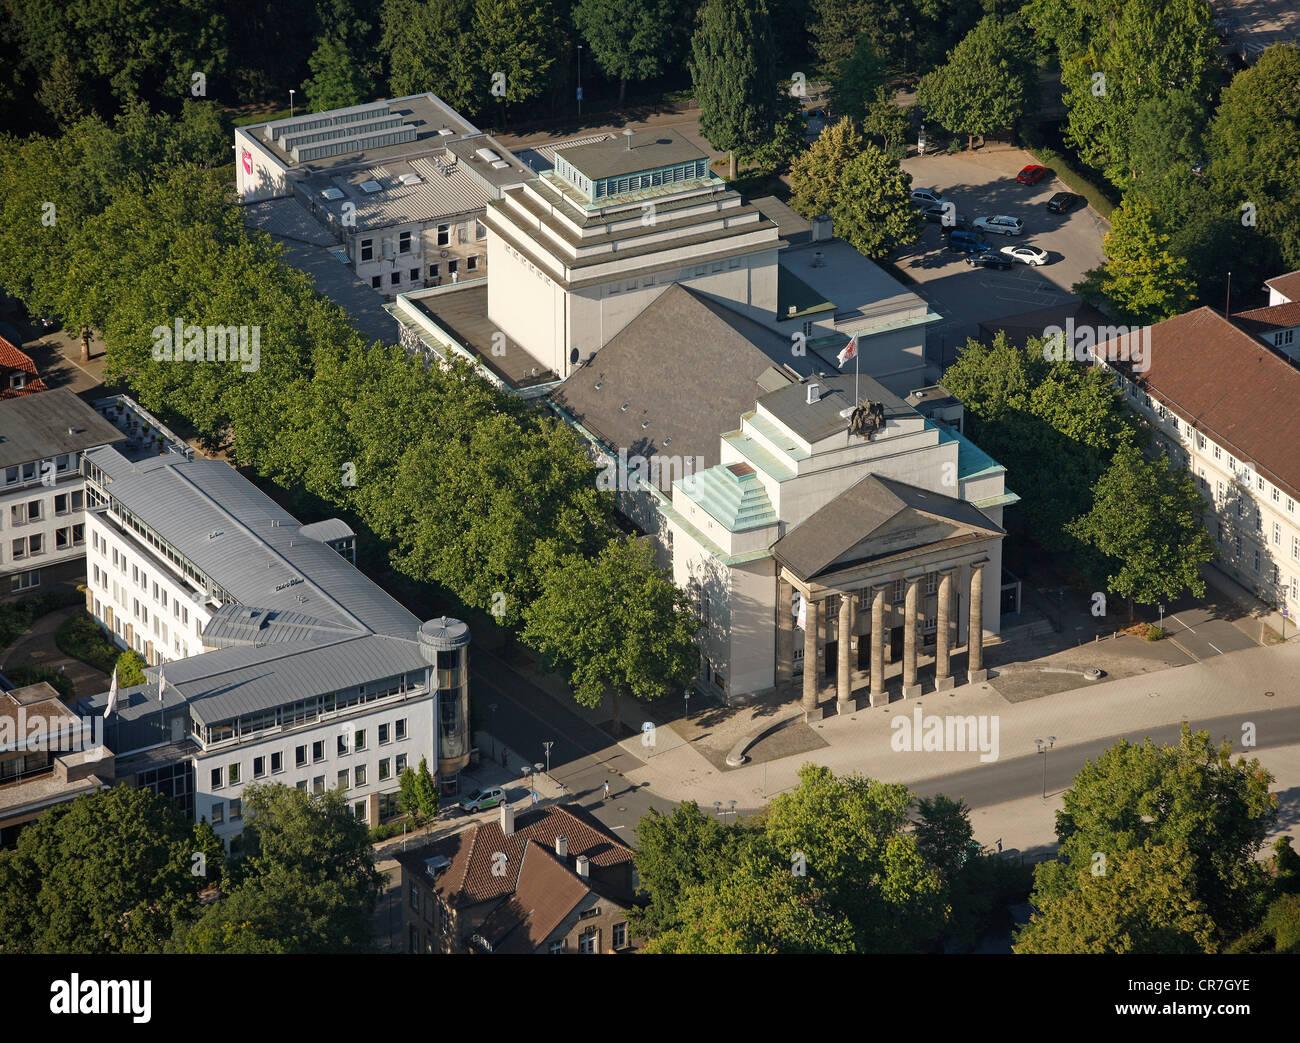 Aerial view, Landestheater Detmold building, Ostwestfalen-Lippe, eastern Westphalia, North Rhine-Westphalia, Germany, Europe Stock Photo